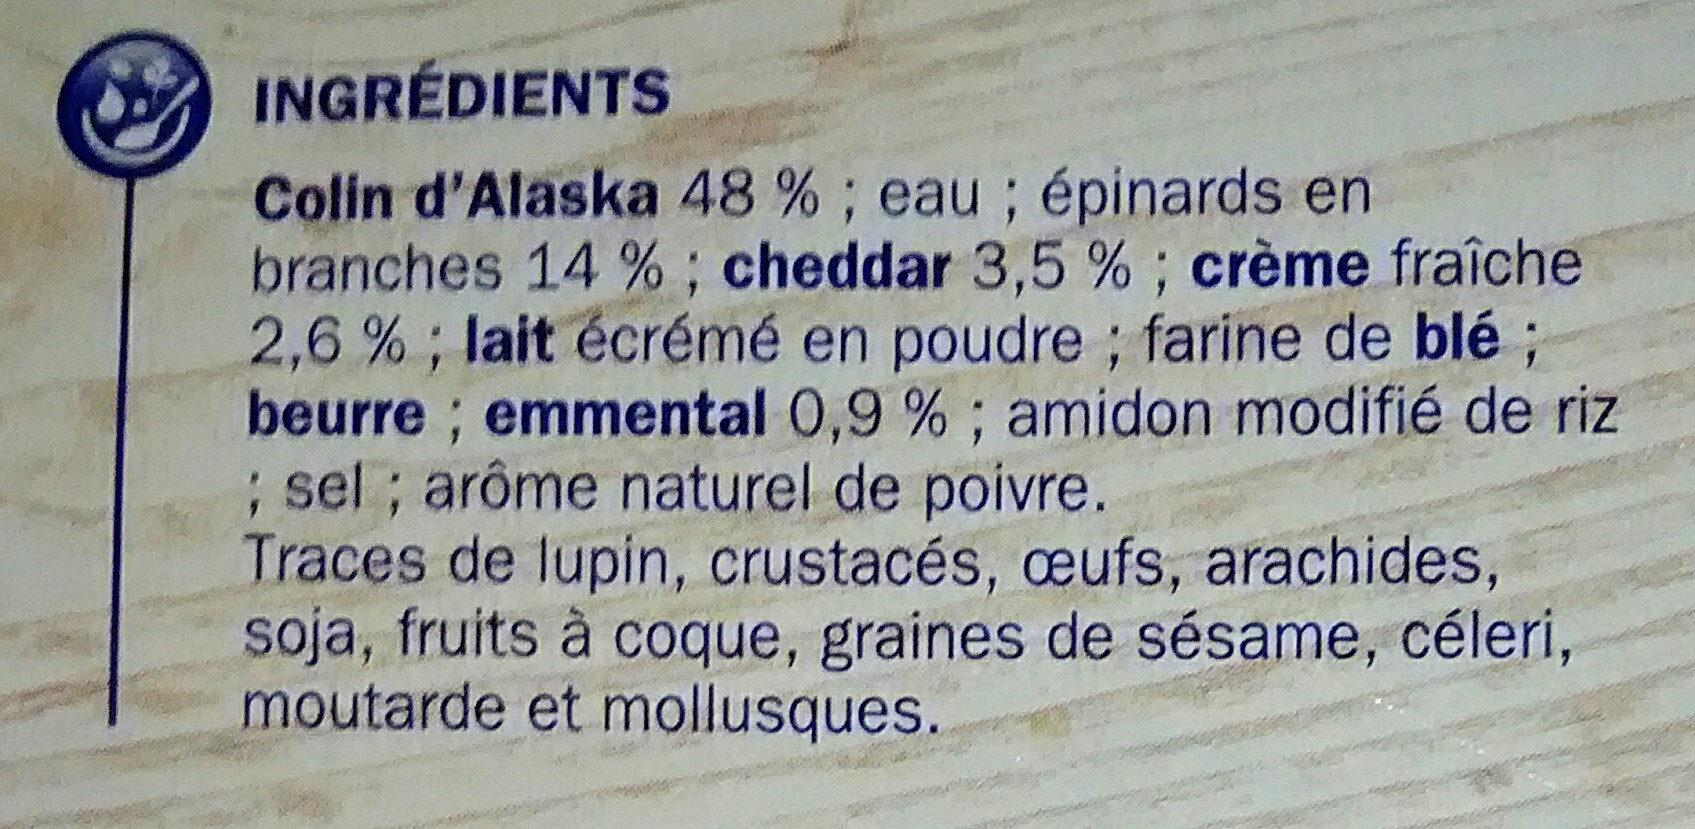 Colin d'Alaska à la Florentine - Ingrediënten - fr